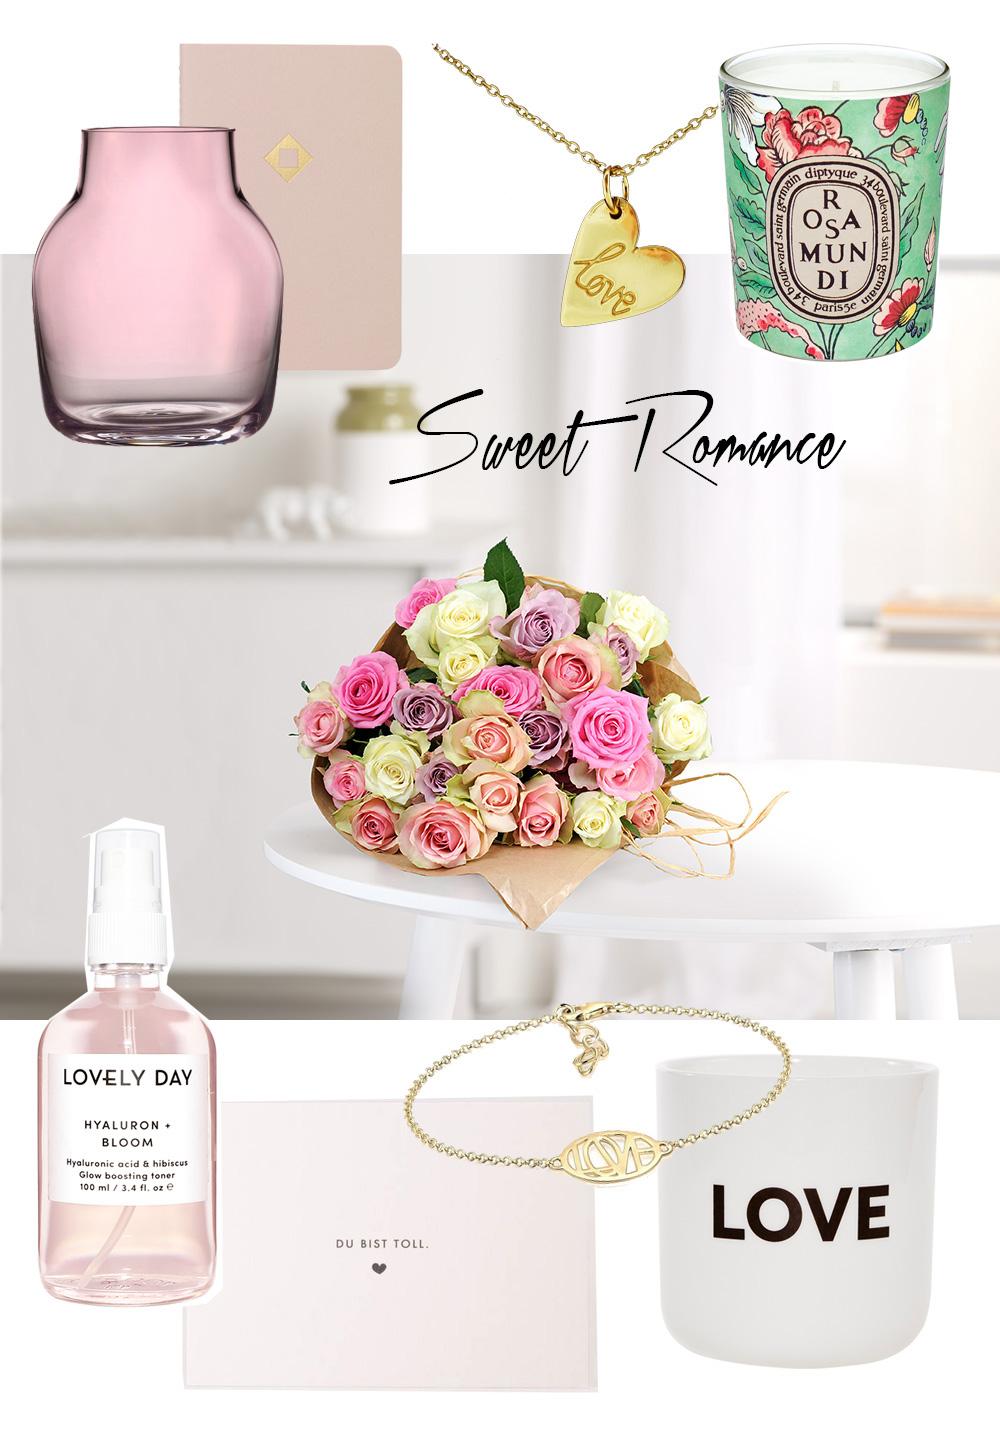 femtastics-muttertagsgeschenke-romantisch-rosen